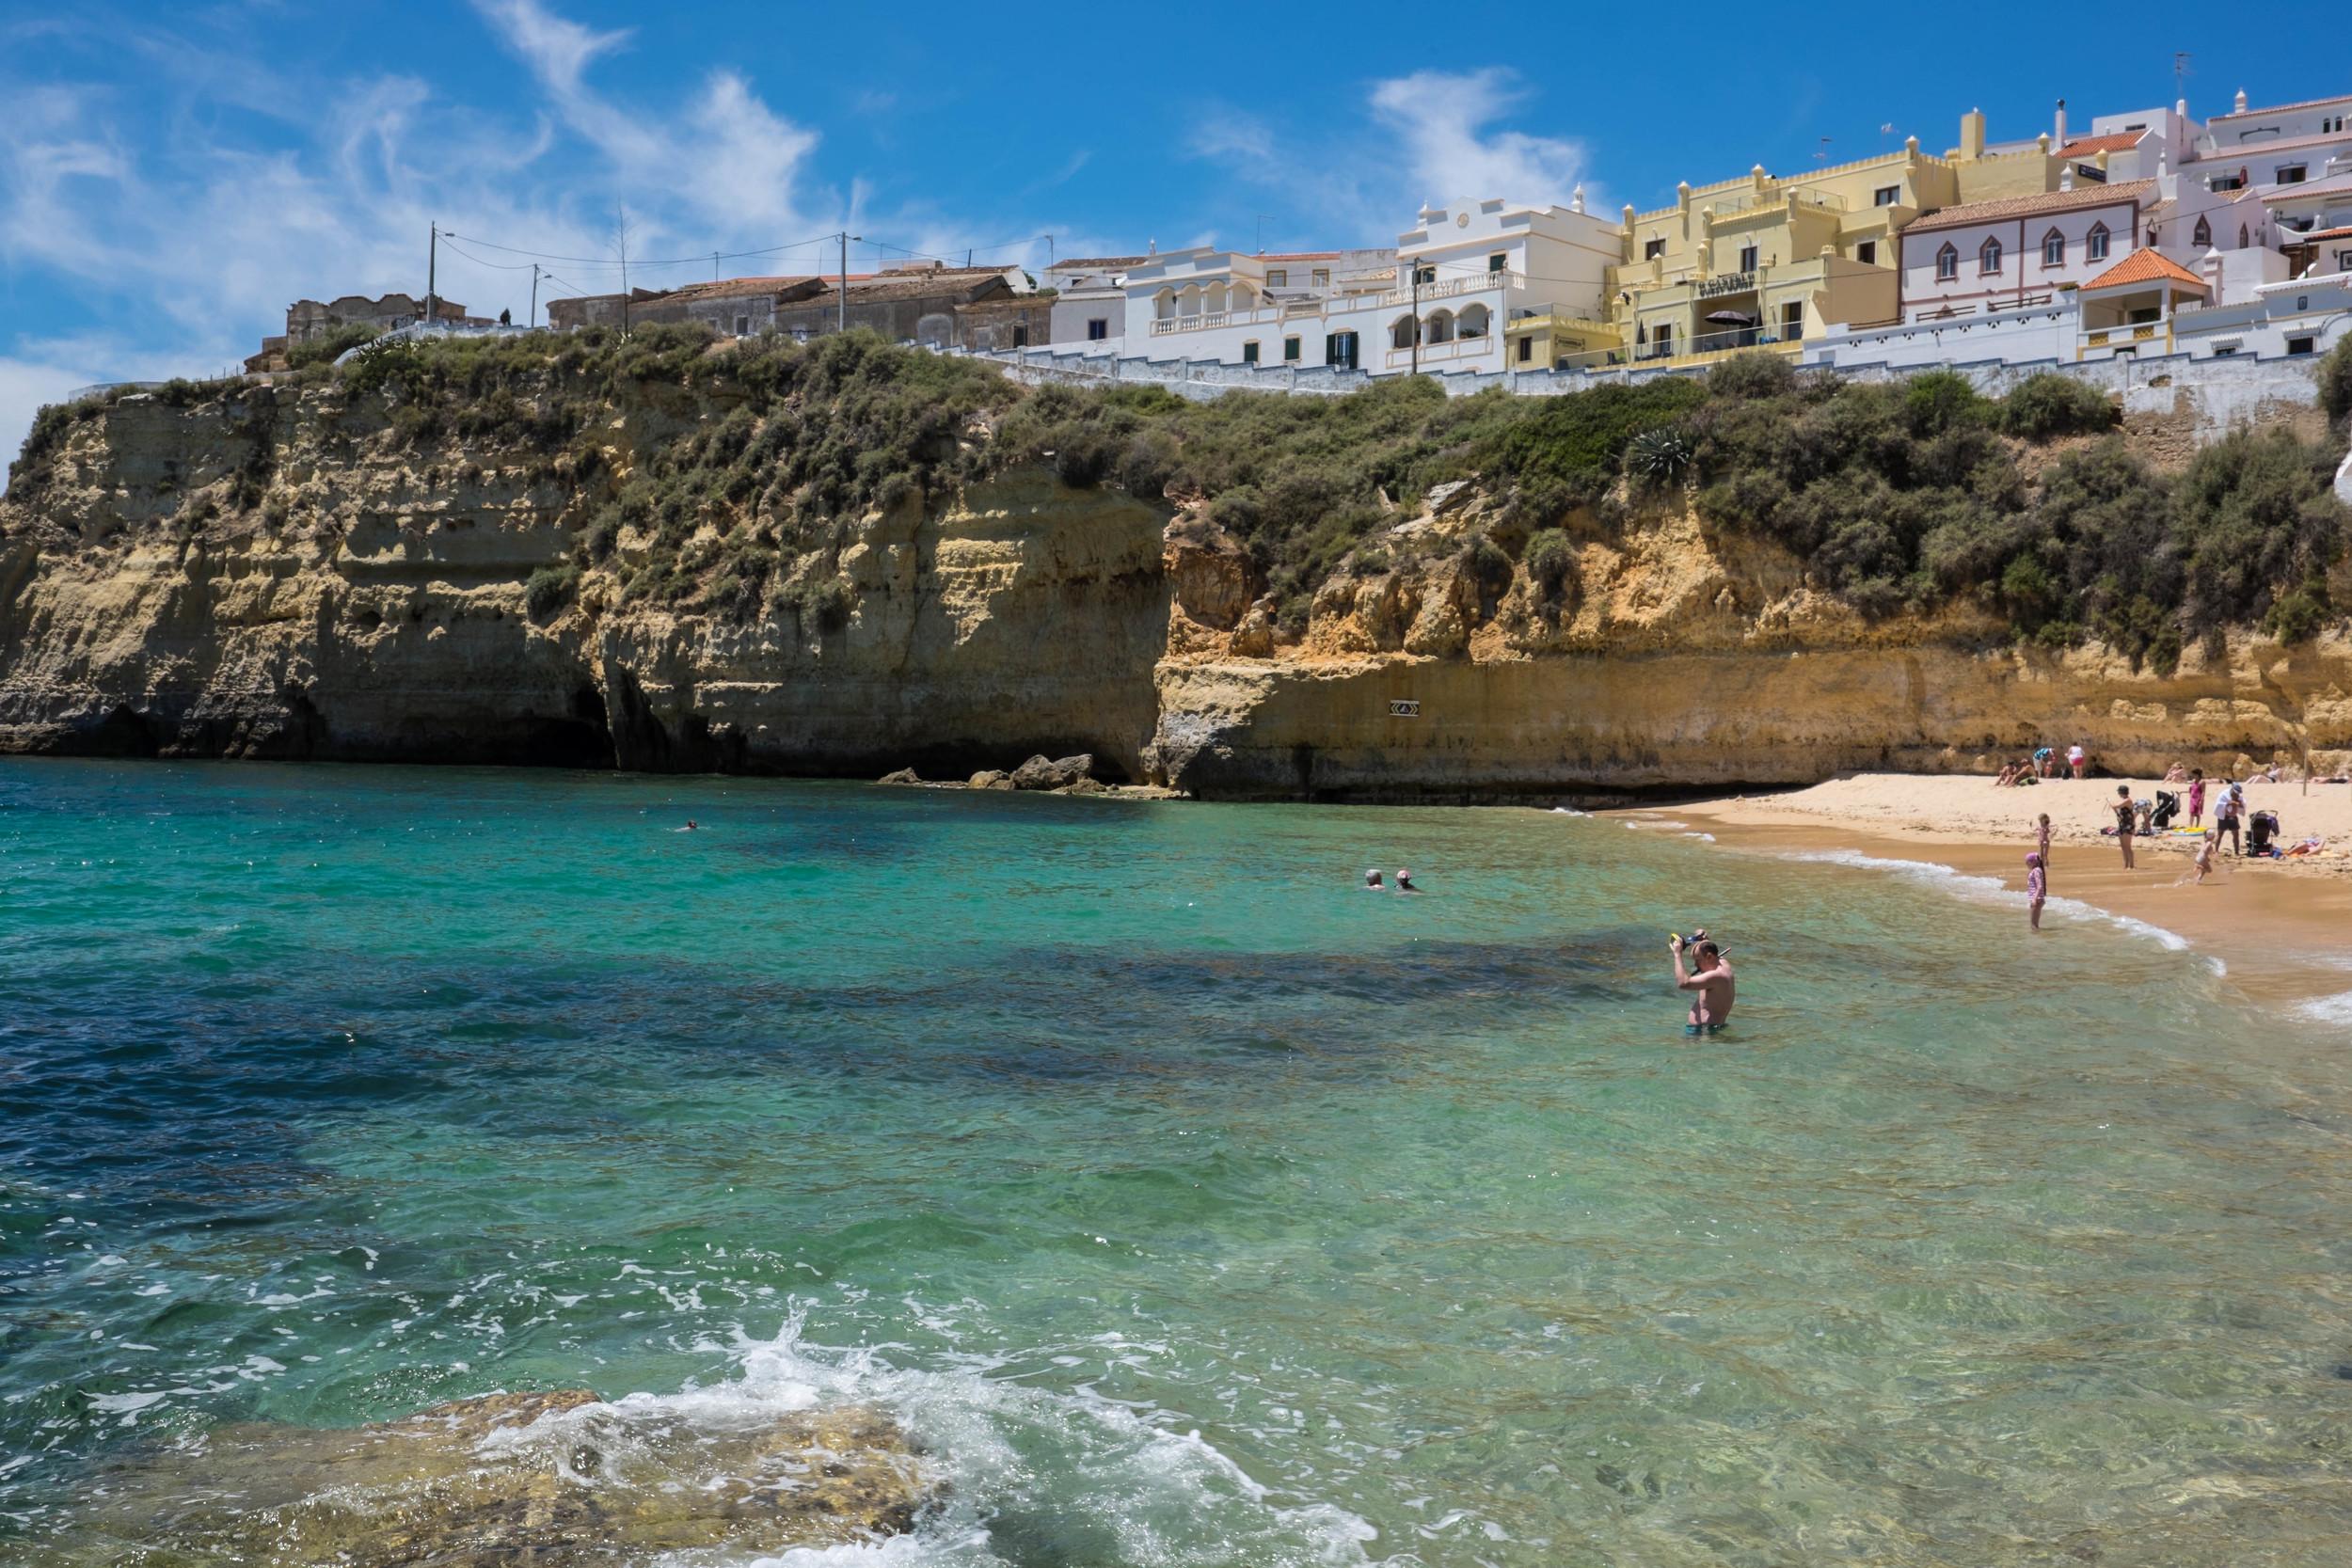 Kristen_Humbert_Philadelpia_Photographer_Travel_Editorial_Portugal-3740.jpg